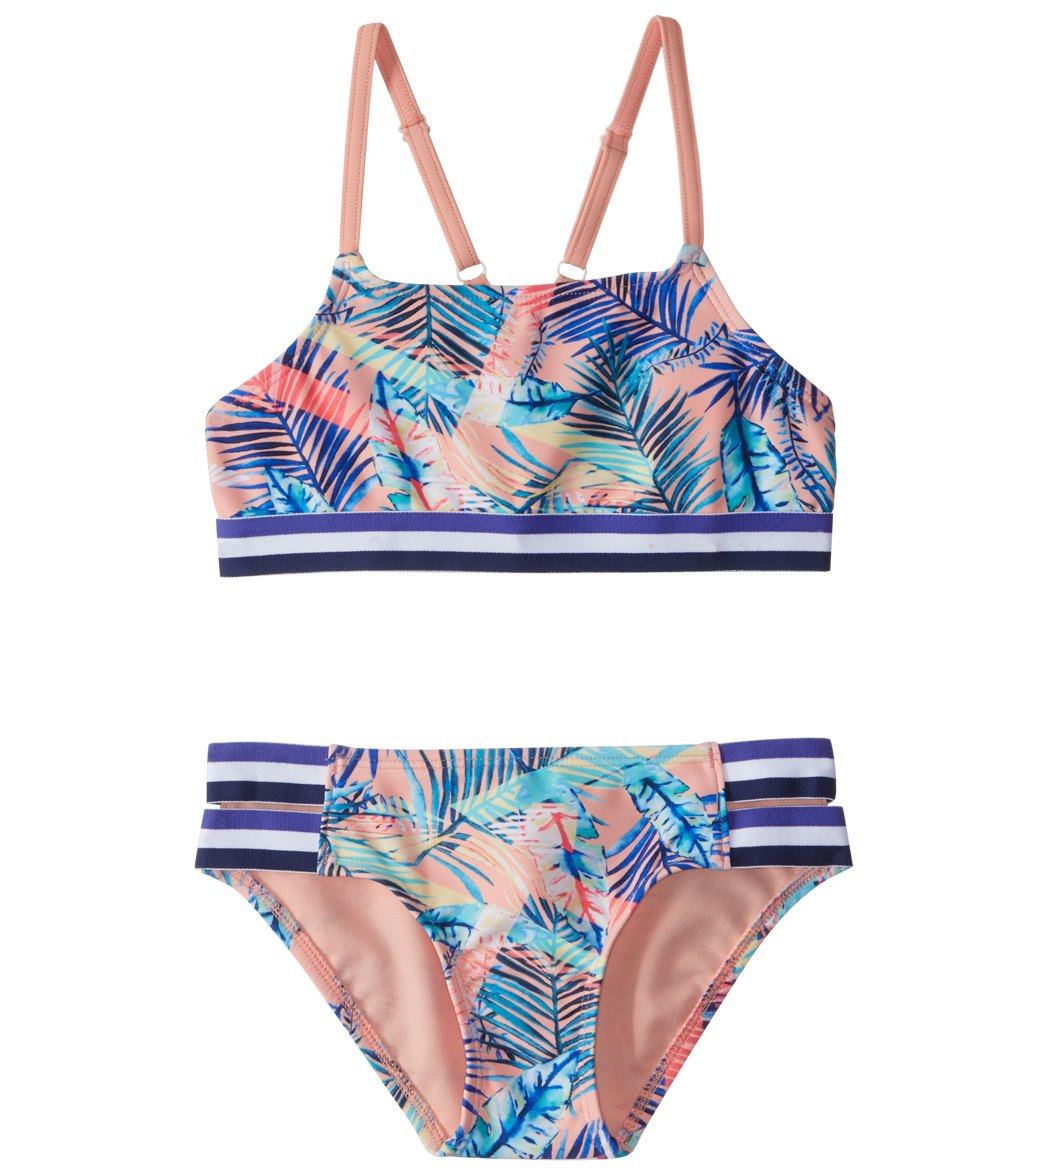 20458eb022 Roxy Kids Girls' Retro Summer Halter Bikini Set (7-16) at SwimOutlet.com